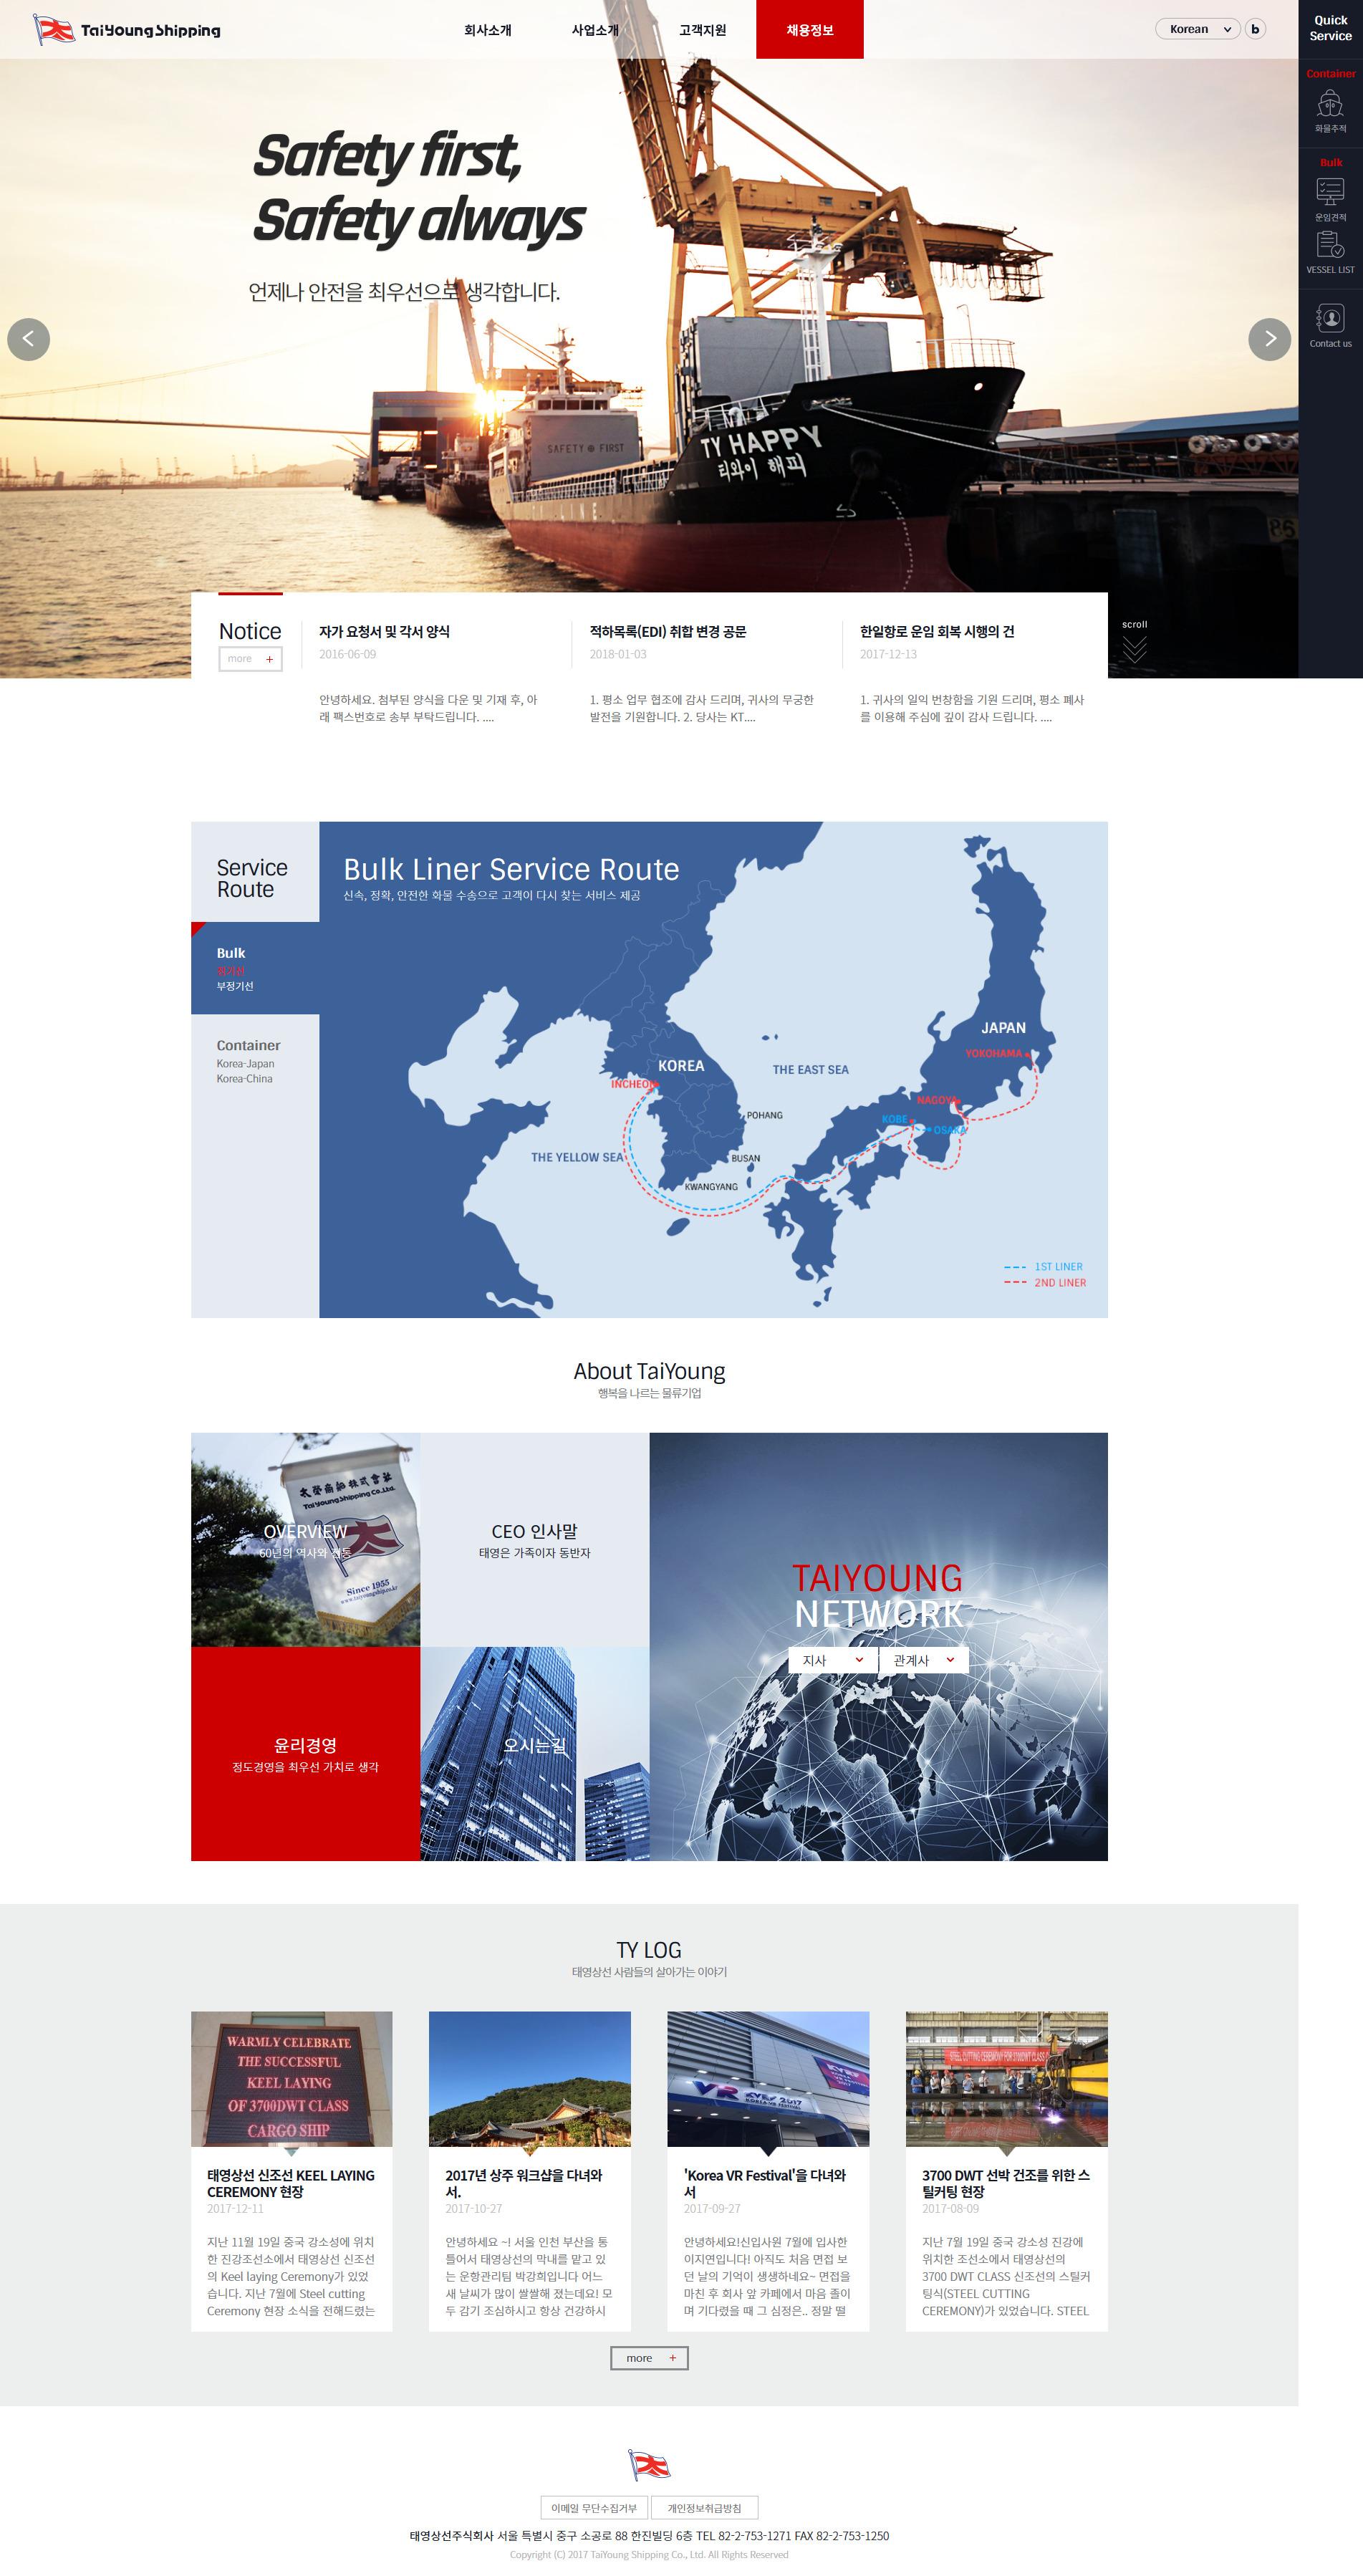 Screenshot-2018-1-4 태영상선.jpg